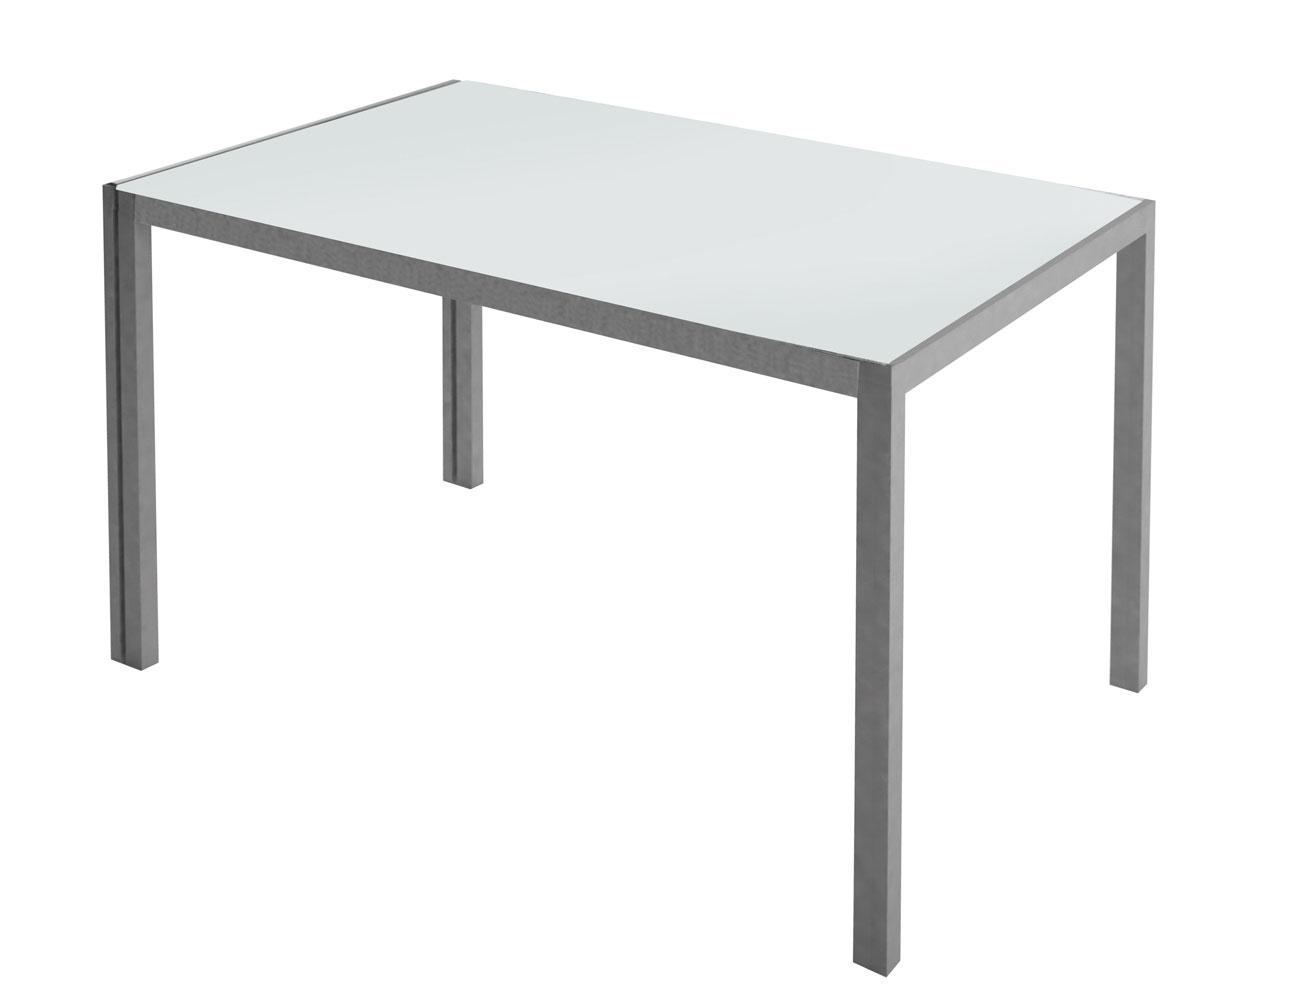 Mesa cocina cristal templado blanco 279 2